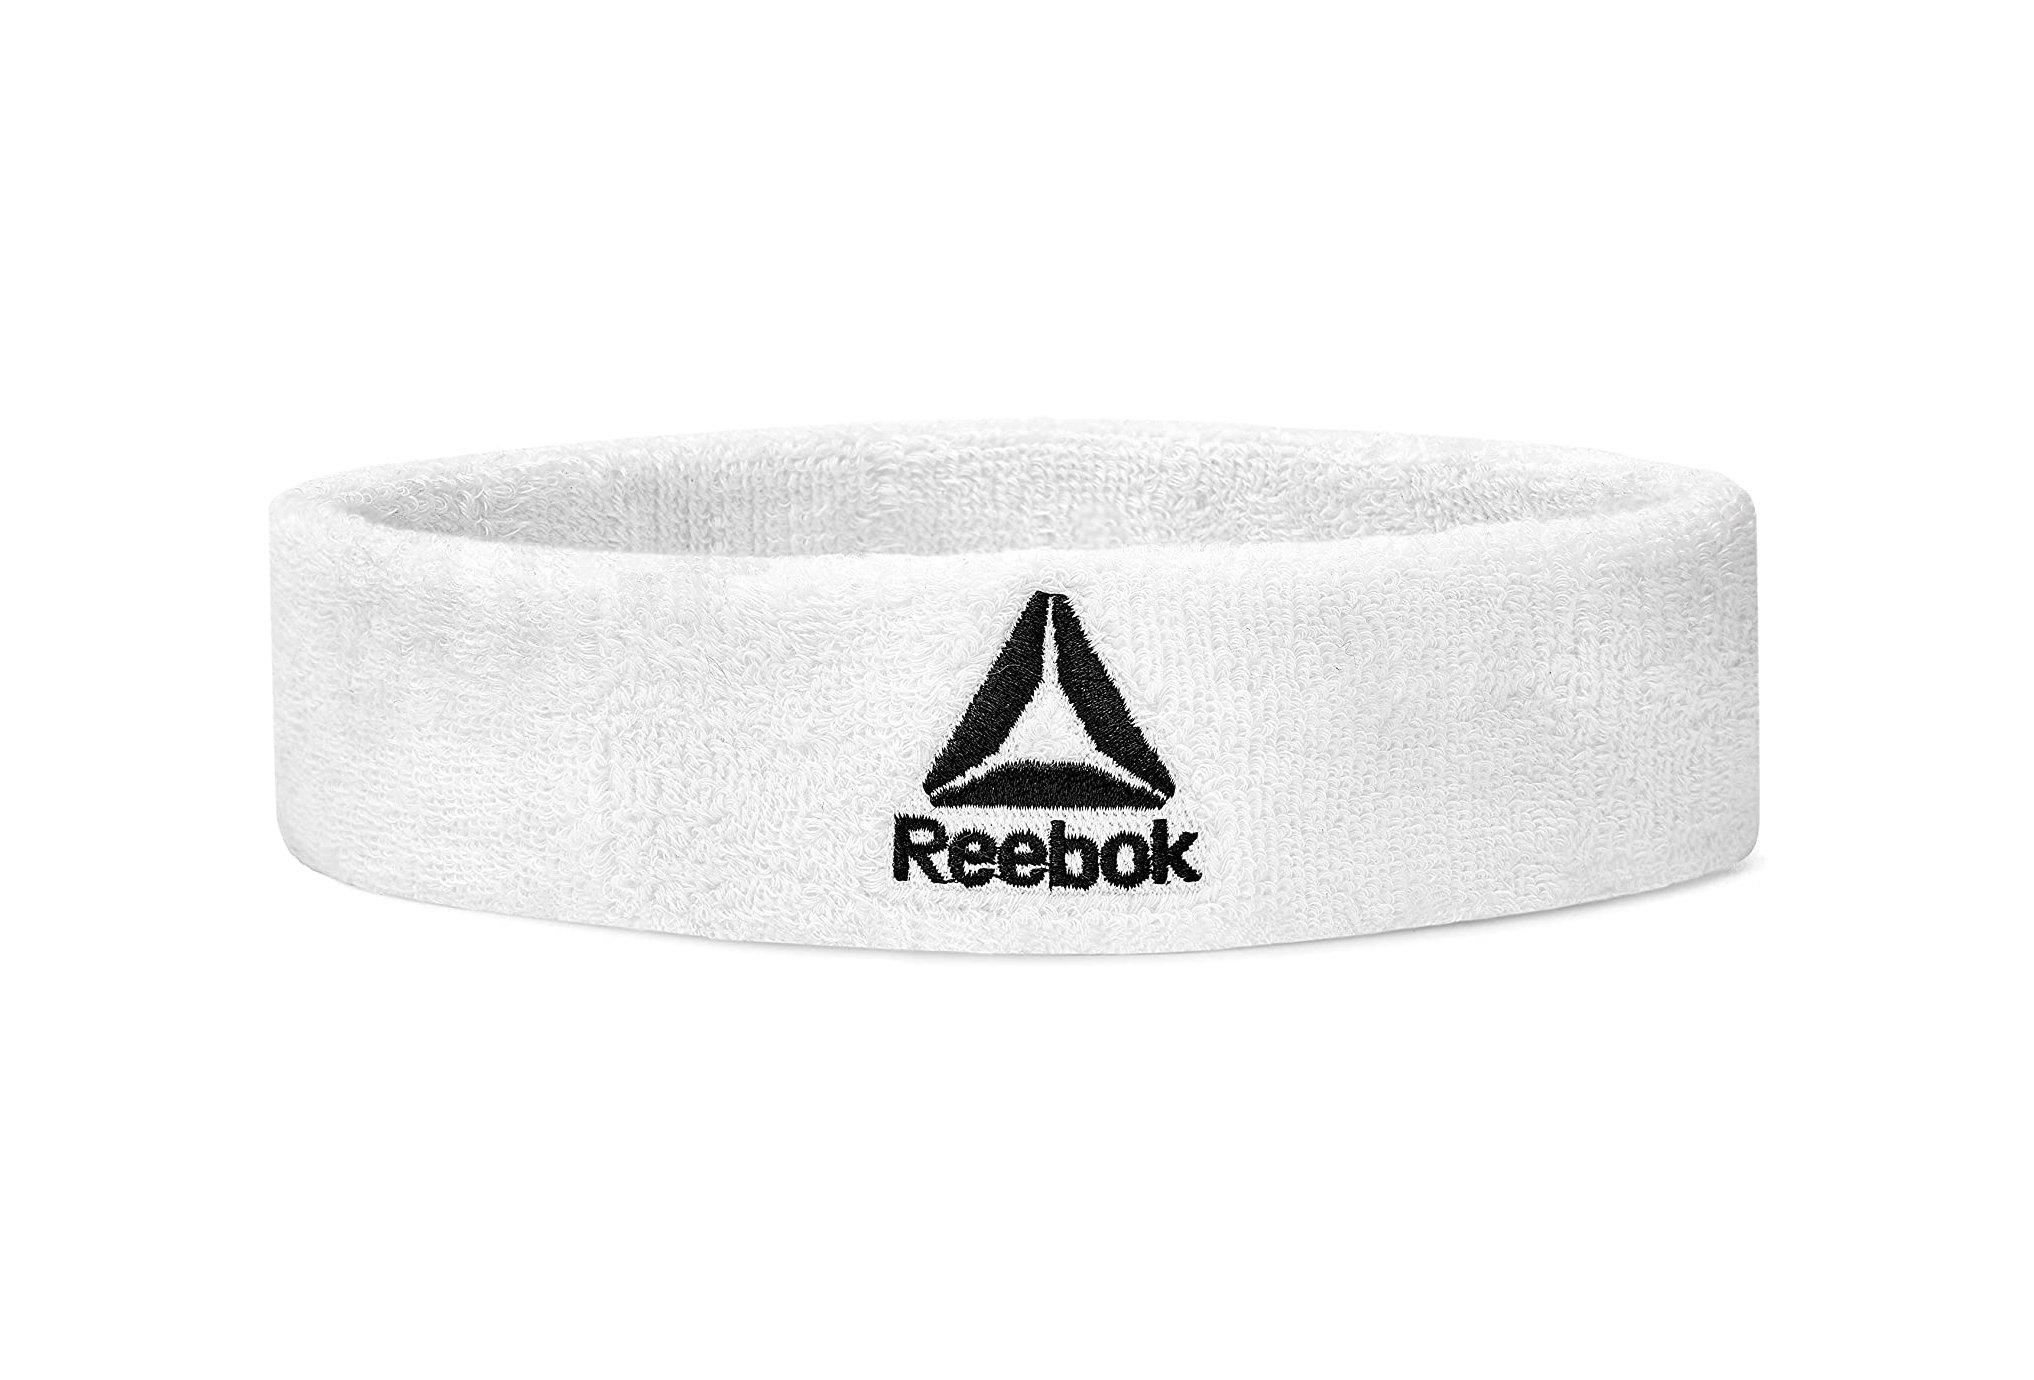 Reebok Sports Headband Casquettes / bandeaux